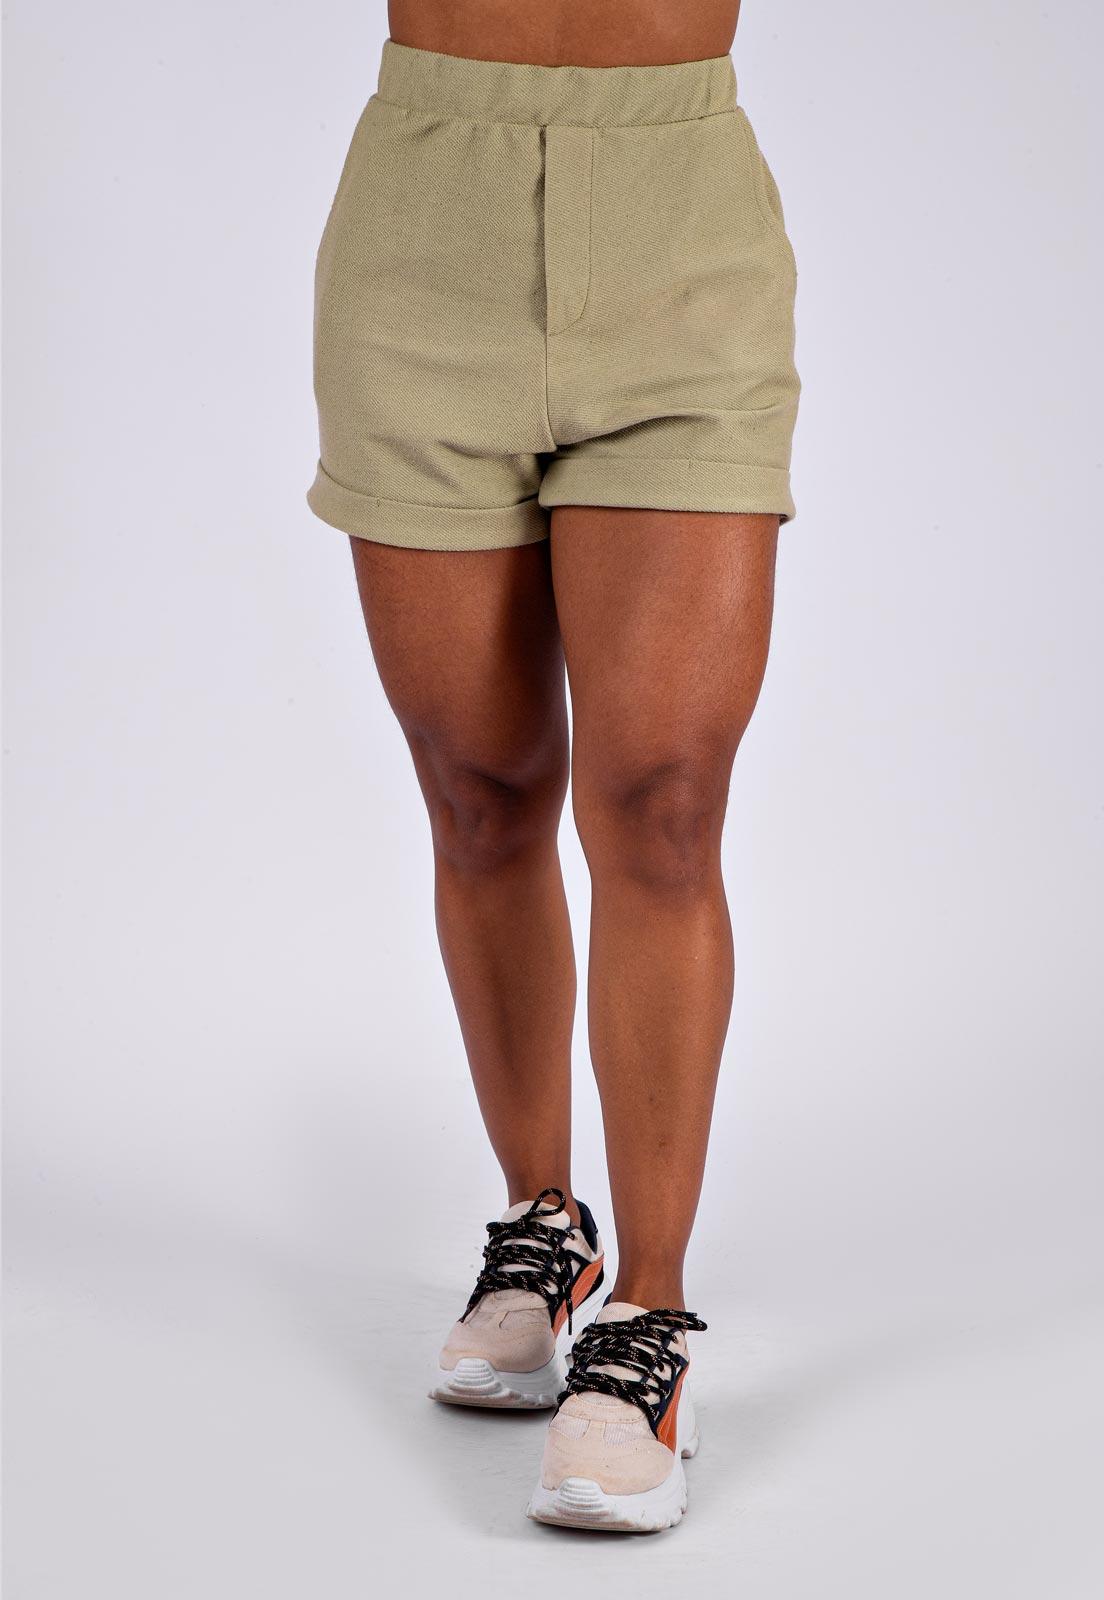 Shorts Feminino Tingimento Natural Verde Oliva